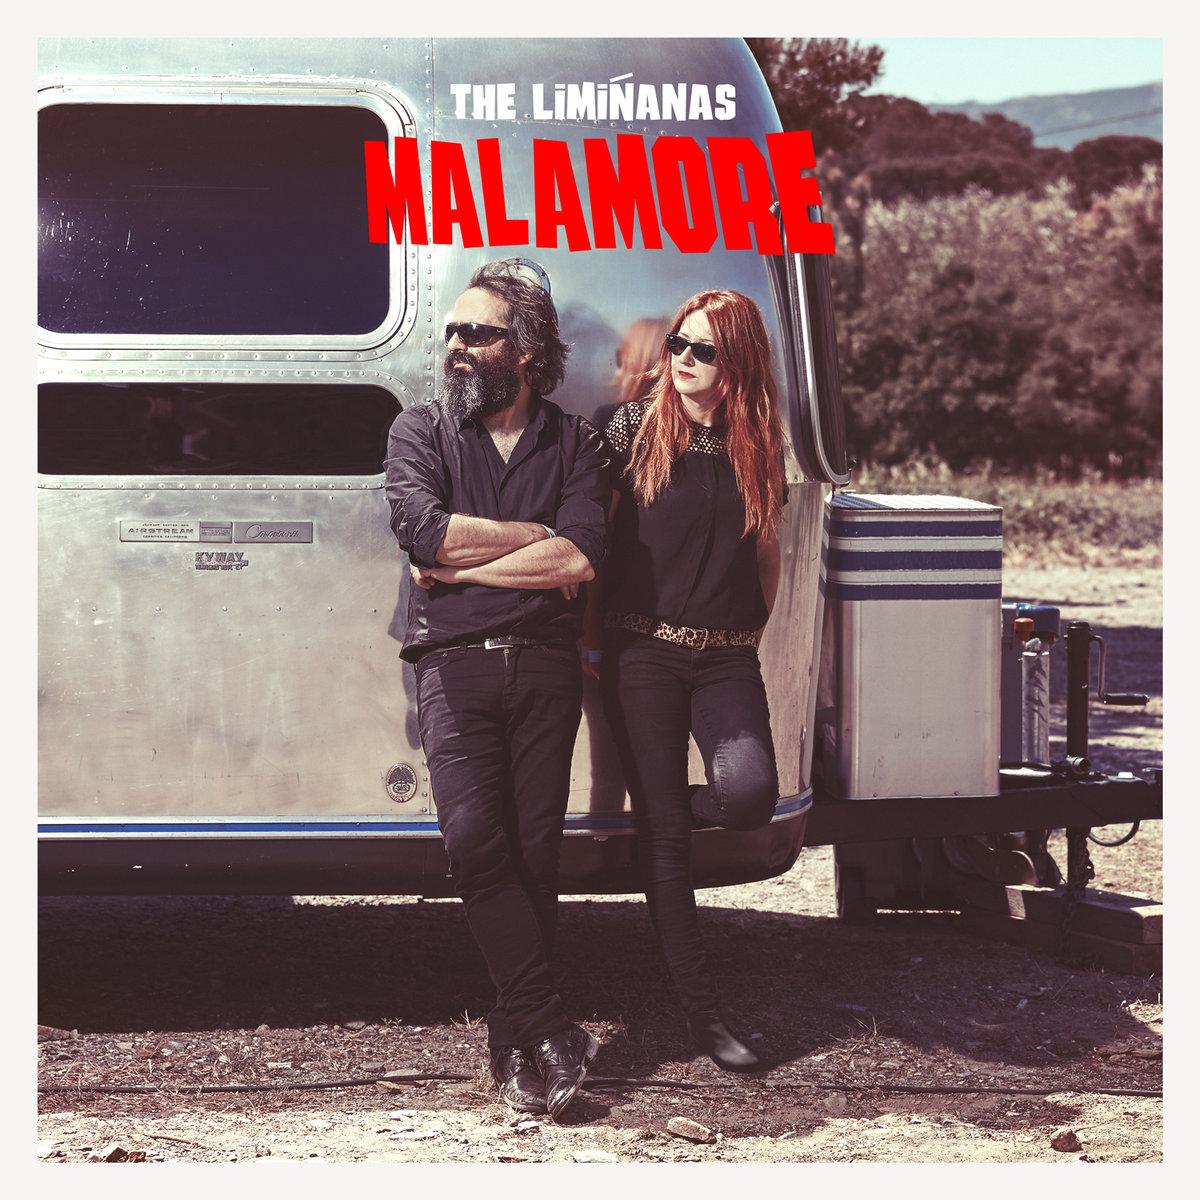 Liminanas Malamore